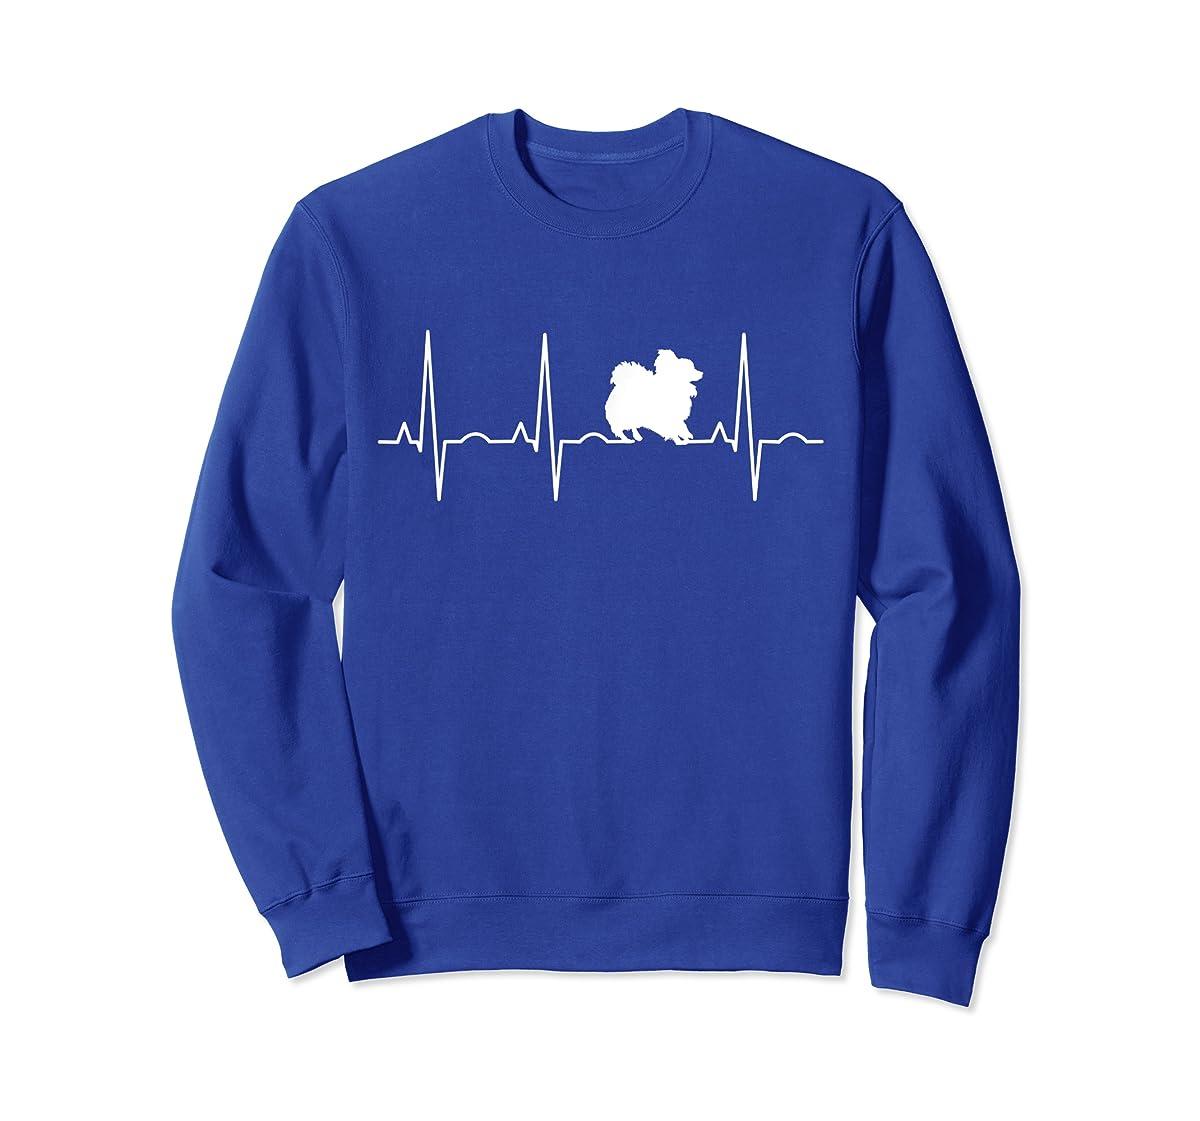 Pomeranian Heartbeat T-Shirt Pom Shirt Gifts Dog Lover-Sweatshirt-Royal